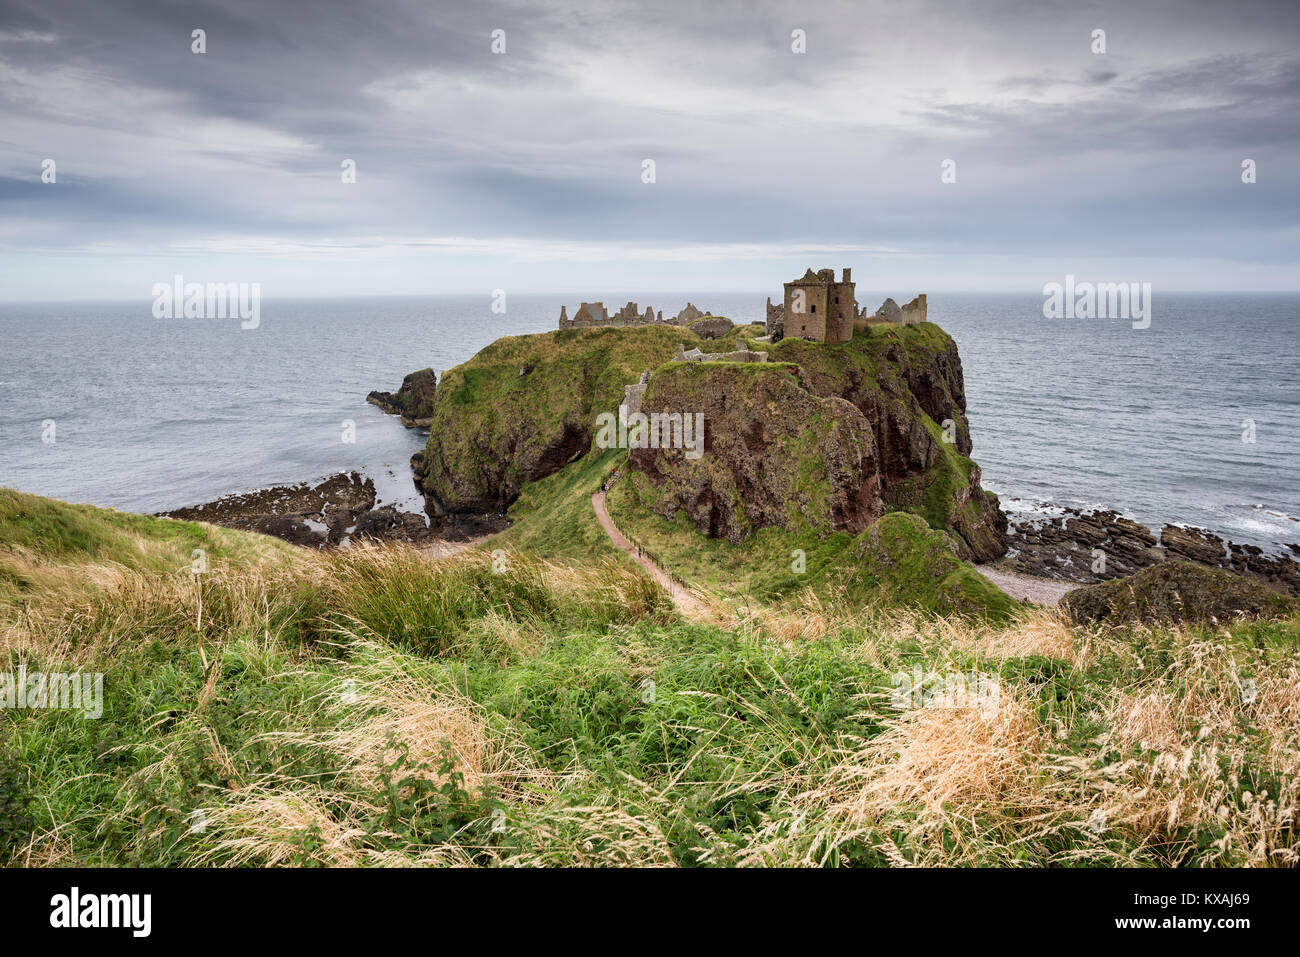 Dunnottar Castle, North Sea coast near Stonehaven, Scotland, Great Britain - Stock Image